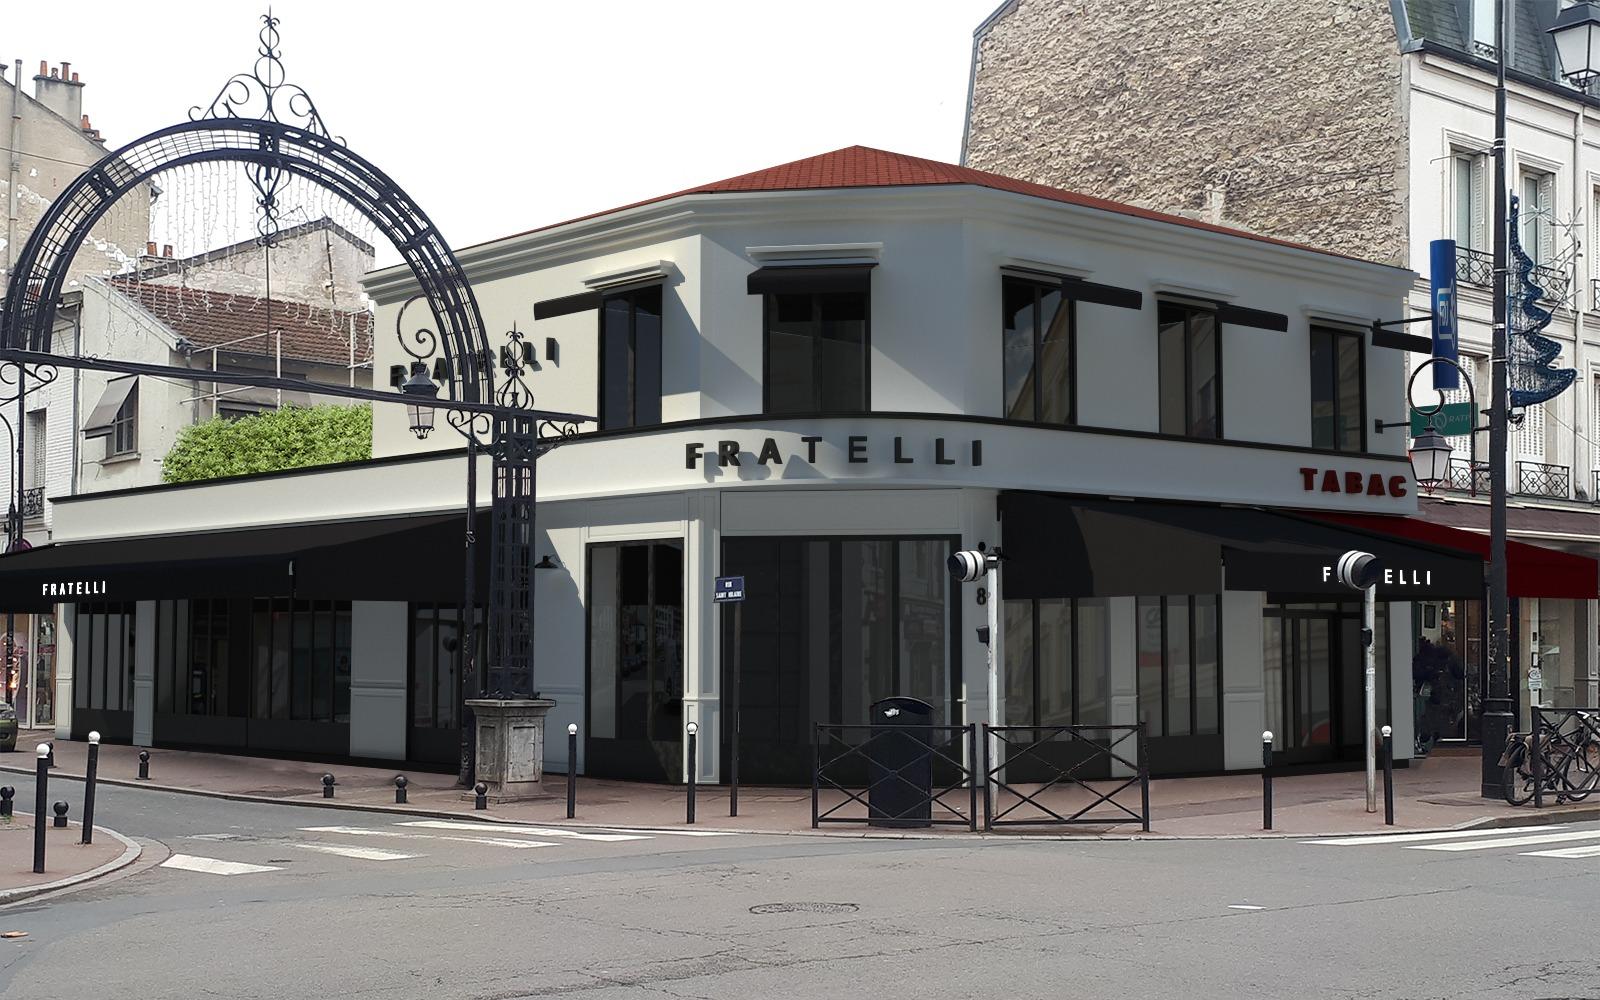 1:FRATELLI